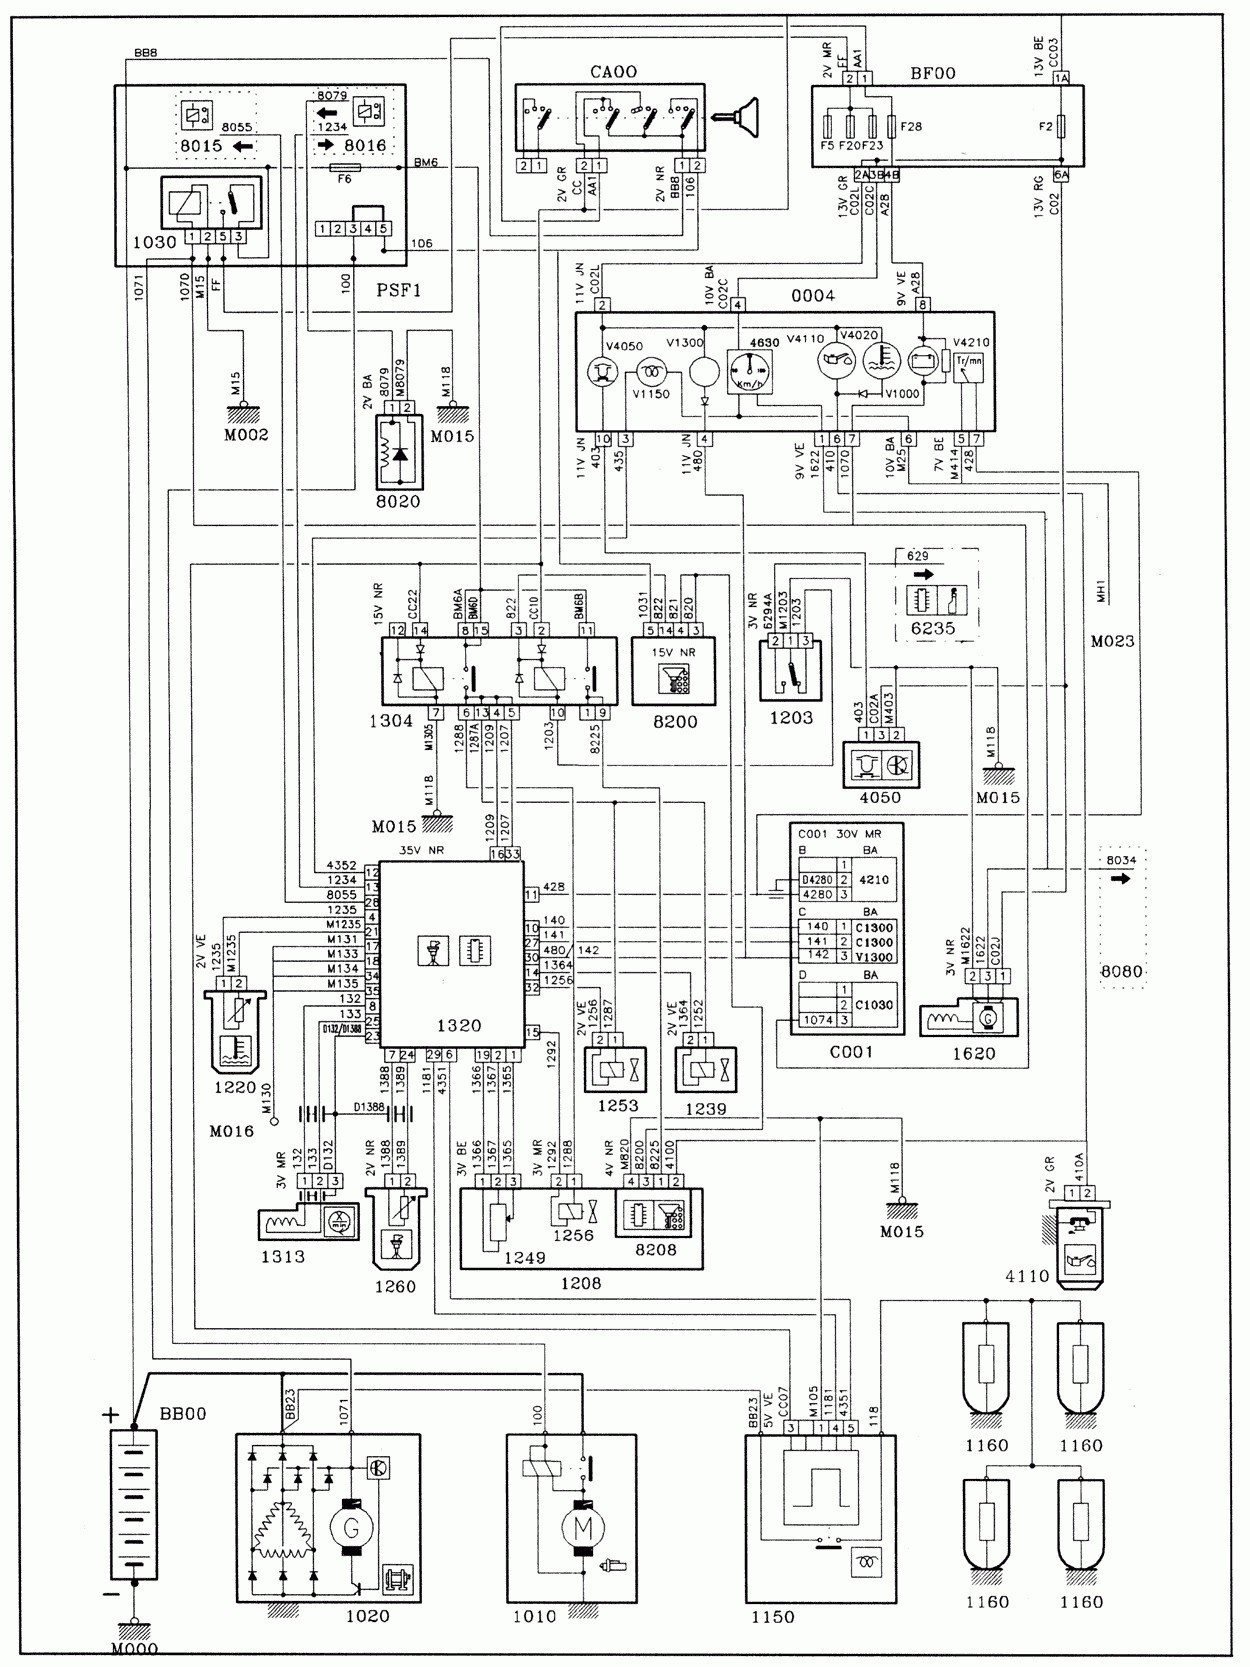 [DIAGRAM_5UK]  5915 Peugeot 207 Engine Diagram Peugeot 306 Hdi Wiring Diagram ... | Wiring  Library | Wiring Diagram Peugeot 306 Radio |  | Wiring Library